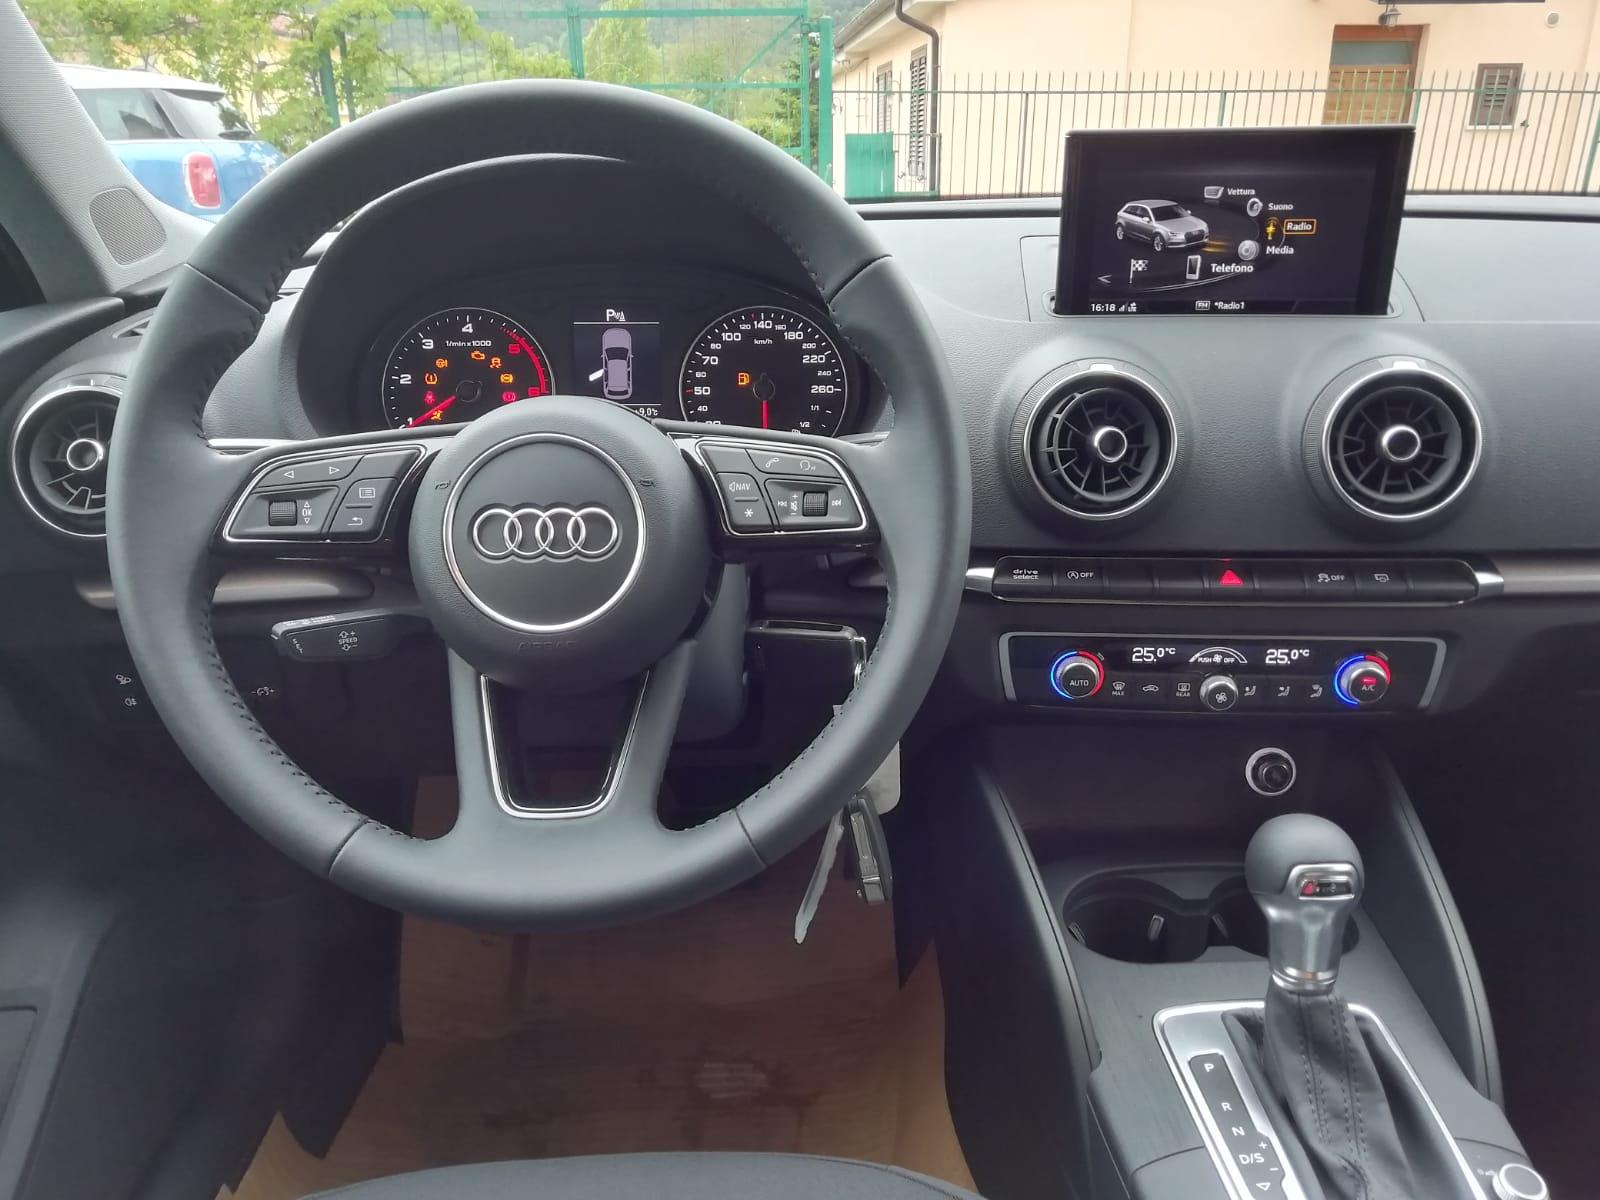 Audi A3 Sportback 1.6 TDI 116 cv S-Tronic Business